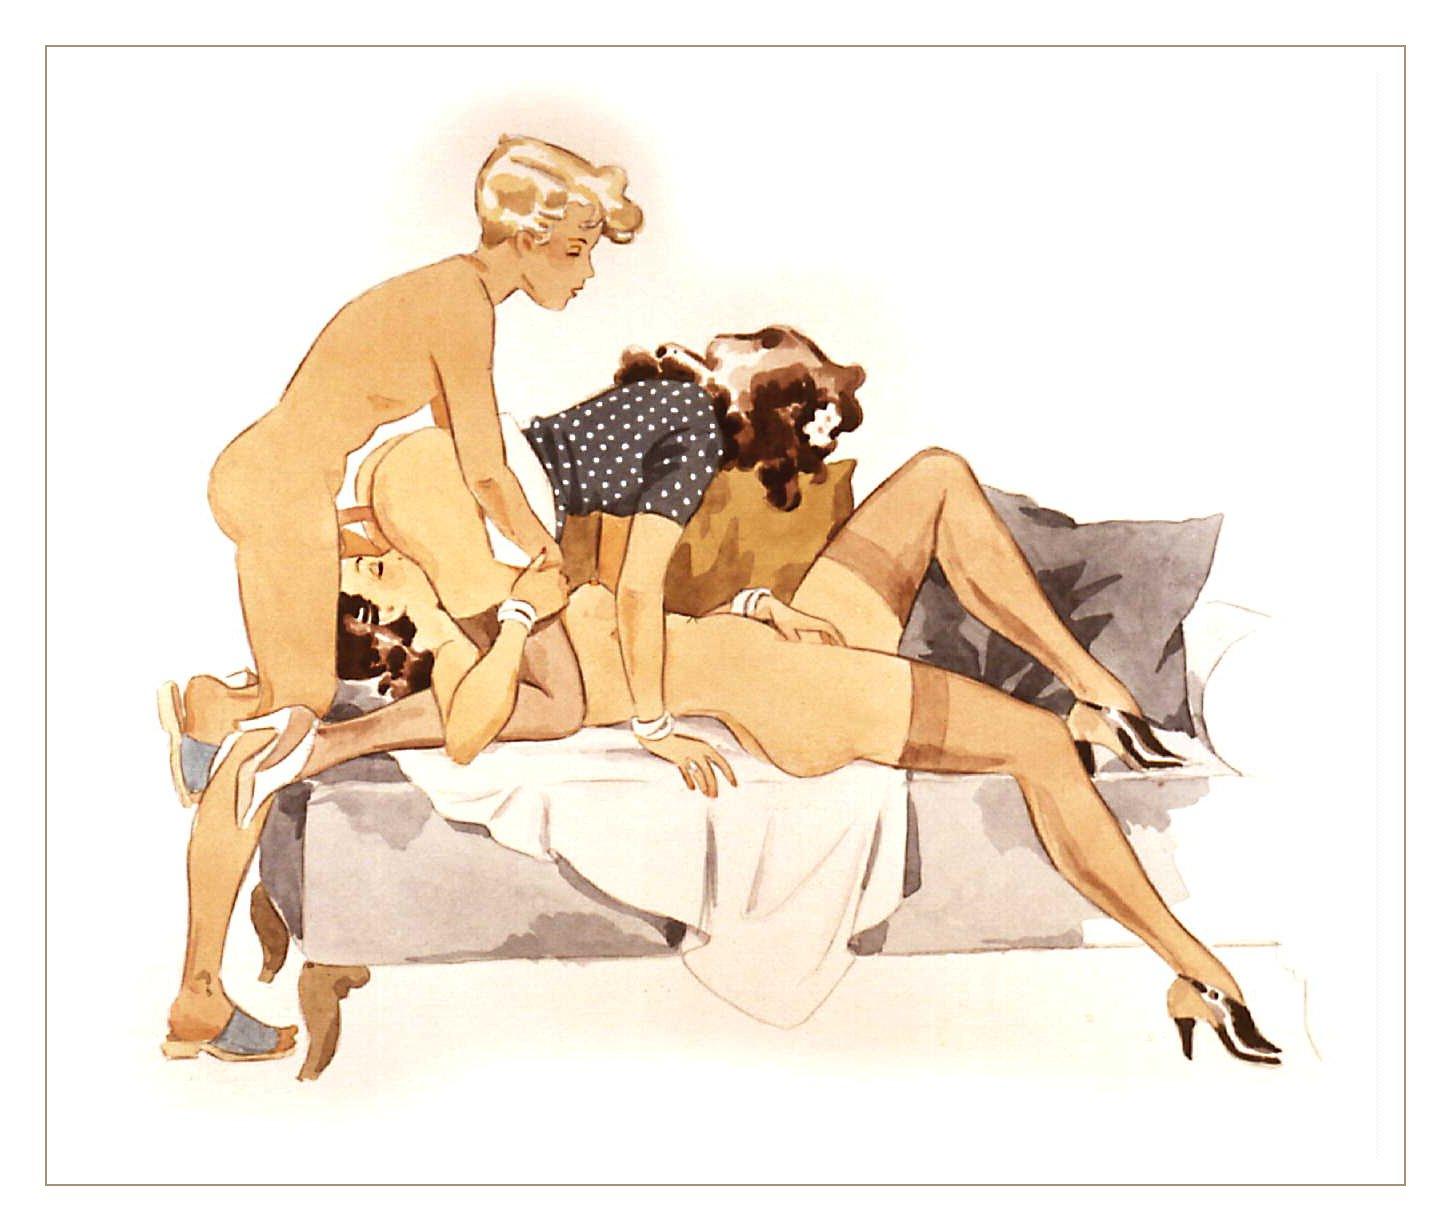 Cuckold erotic art